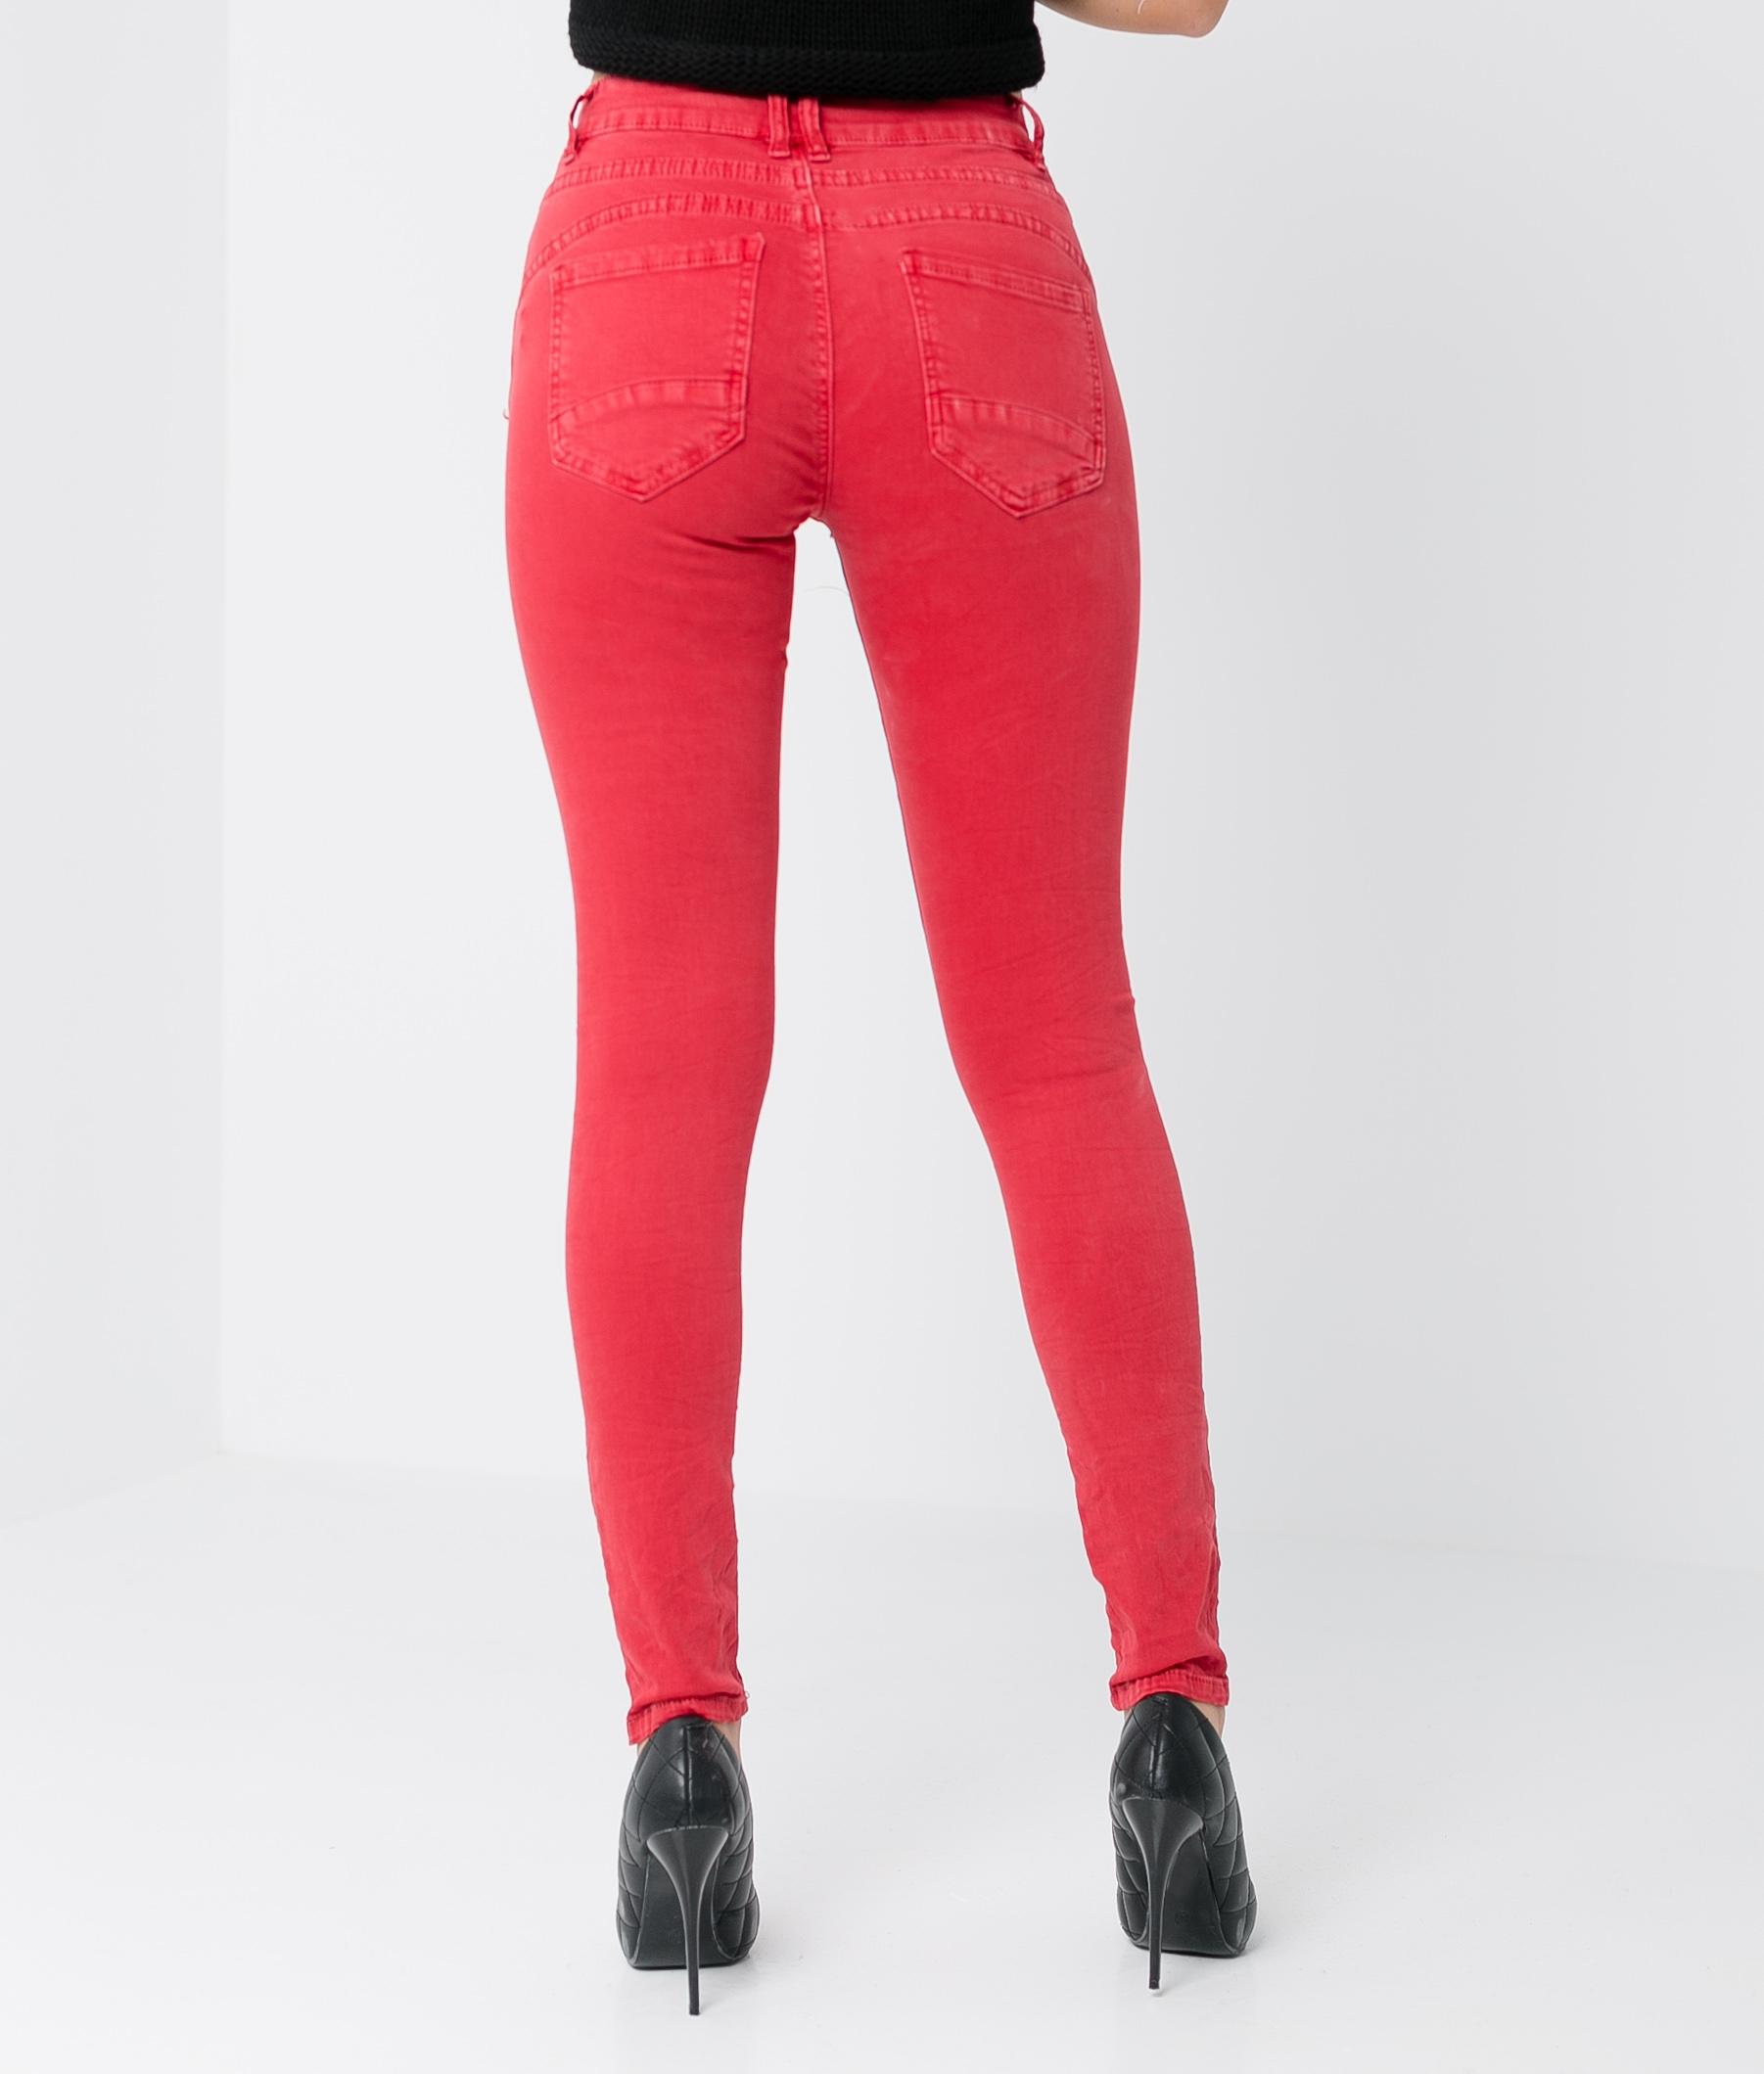 Pantaloni Mainer - Rosso